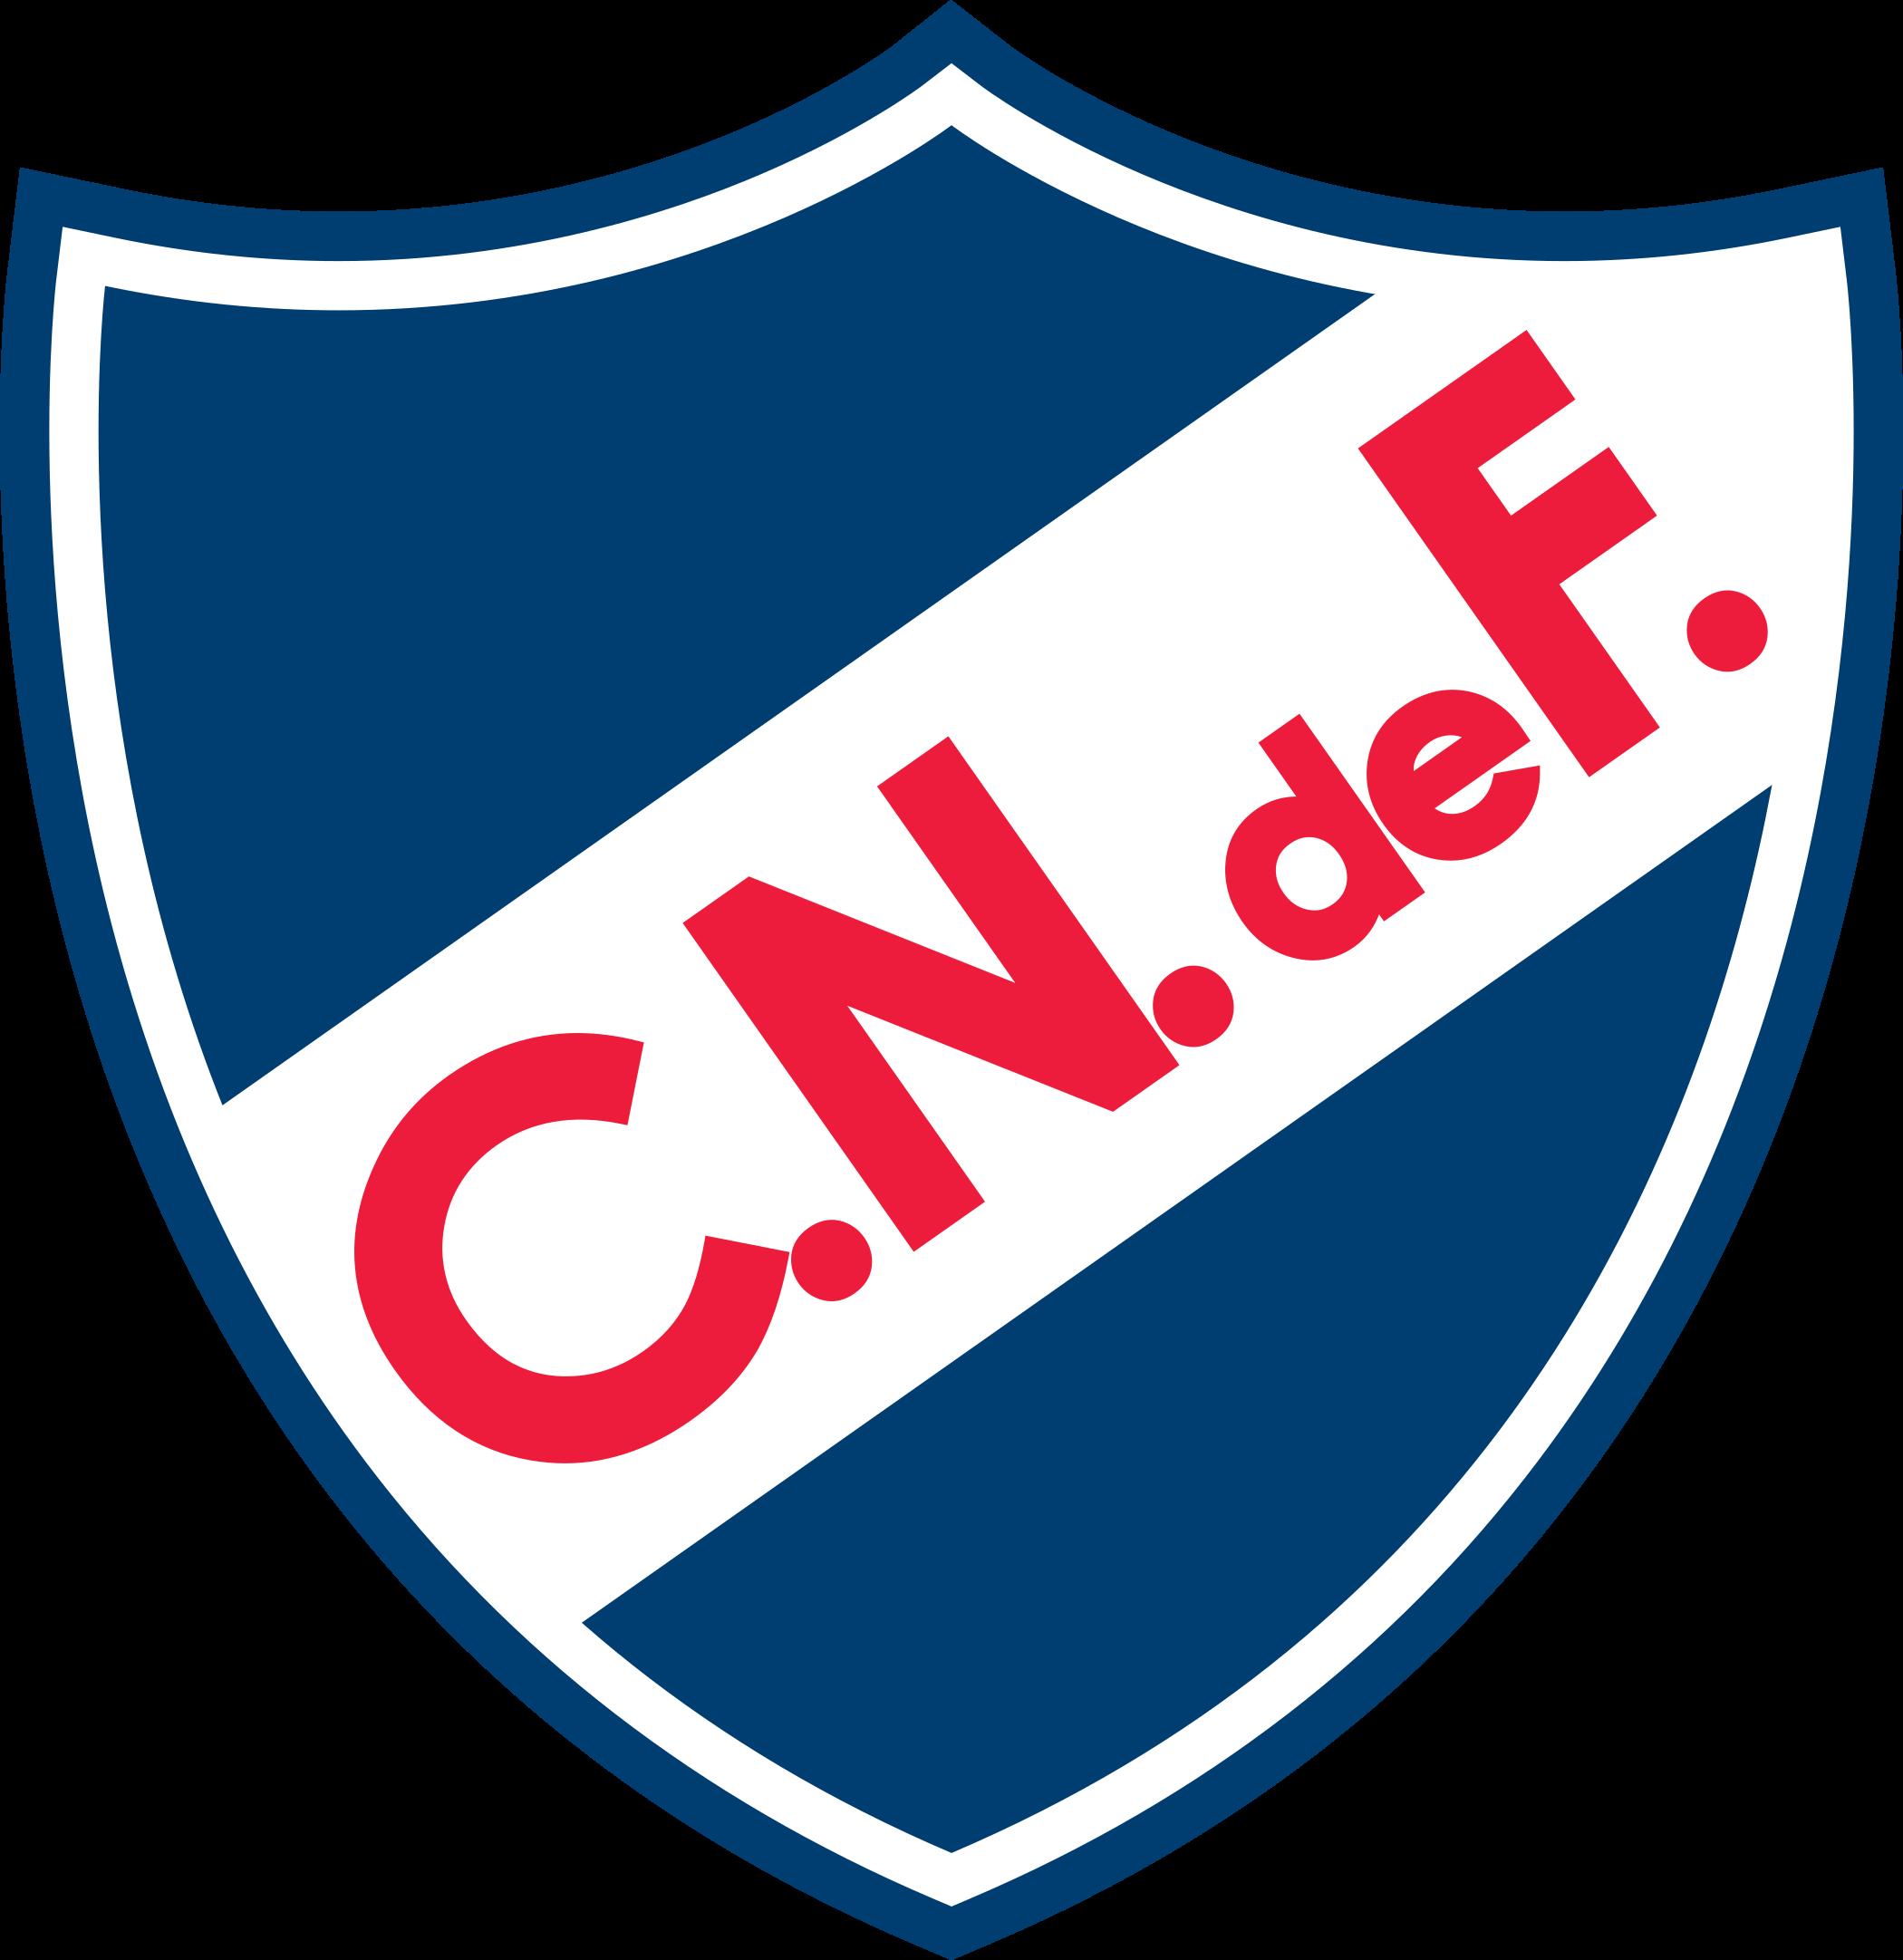 nacional do uruguai logo escudo 1 - Nacional Logo (Uruguay) – Club Nacional de Football Escudo